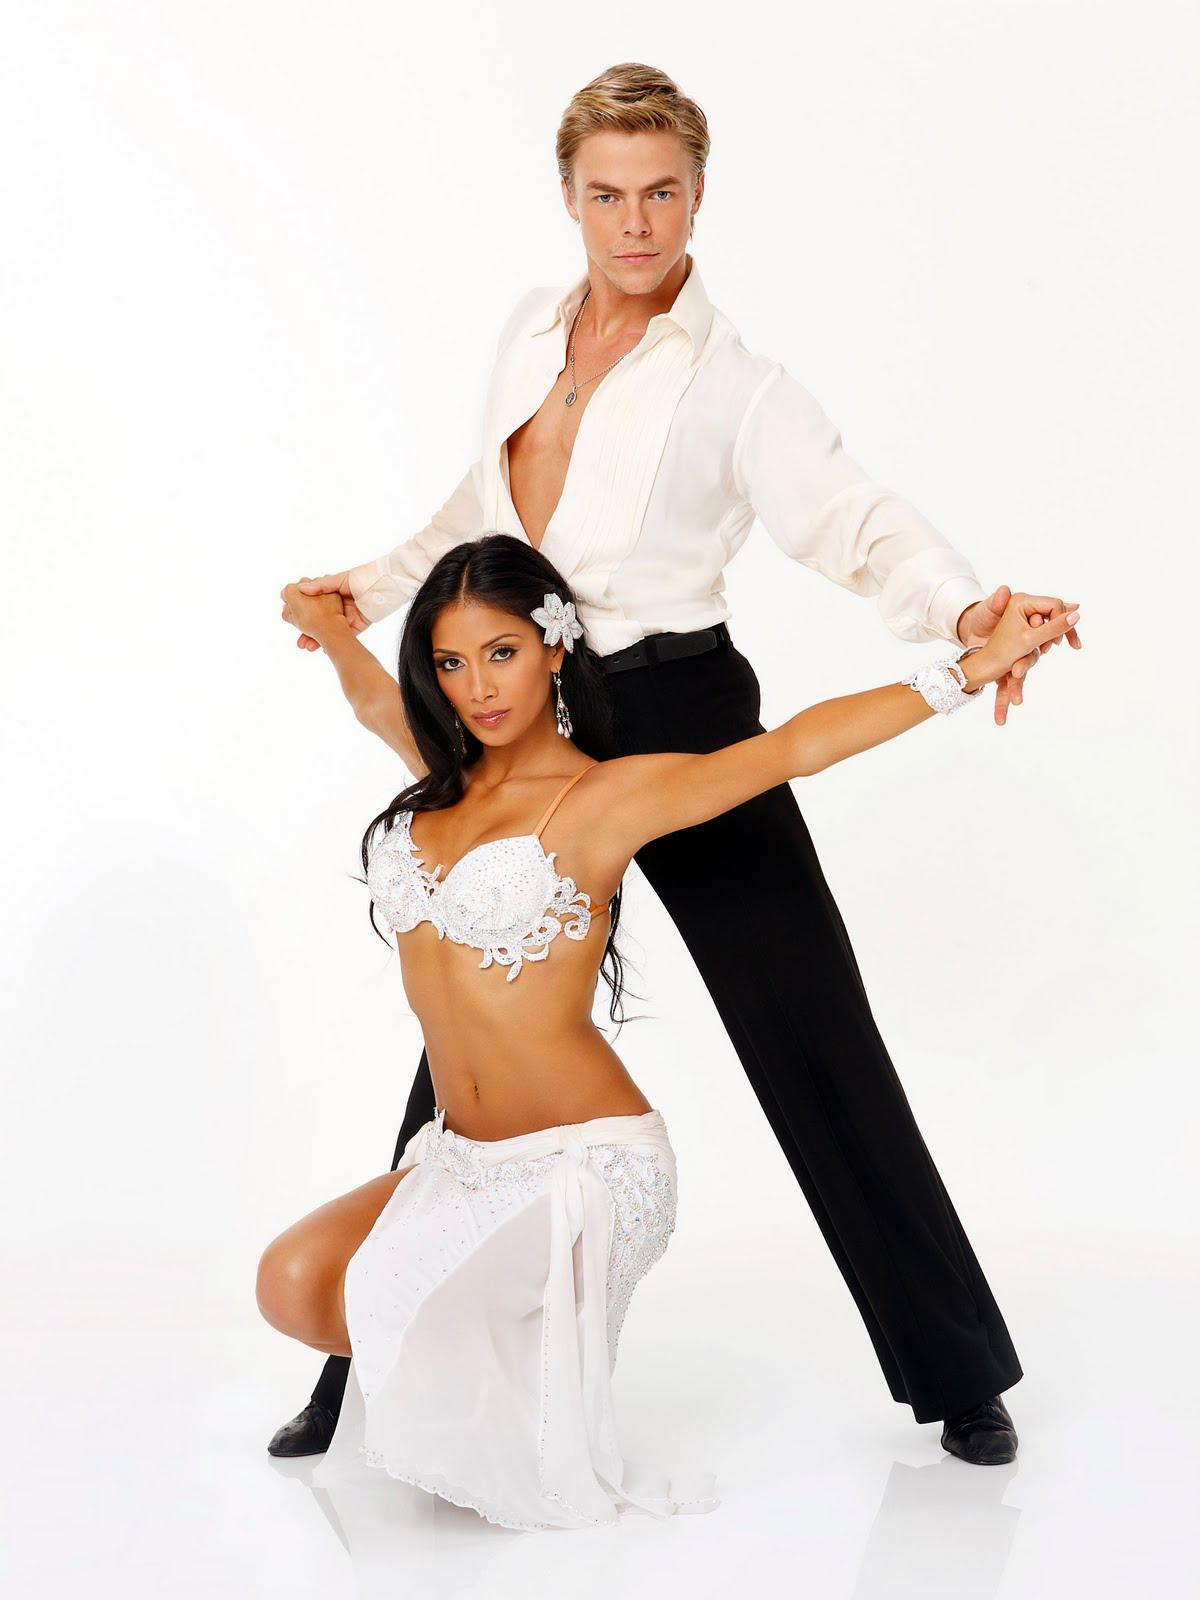 http://4.bp.blogspot.com/_bo1YUY3c3w0/S_yIjSe4b-I/AAAAAAAANJs/OKJGqeAJ5hs/s1600/Nicole-Scherzinger-Derek-Hough-Dancing-With-the-Stars.jpg